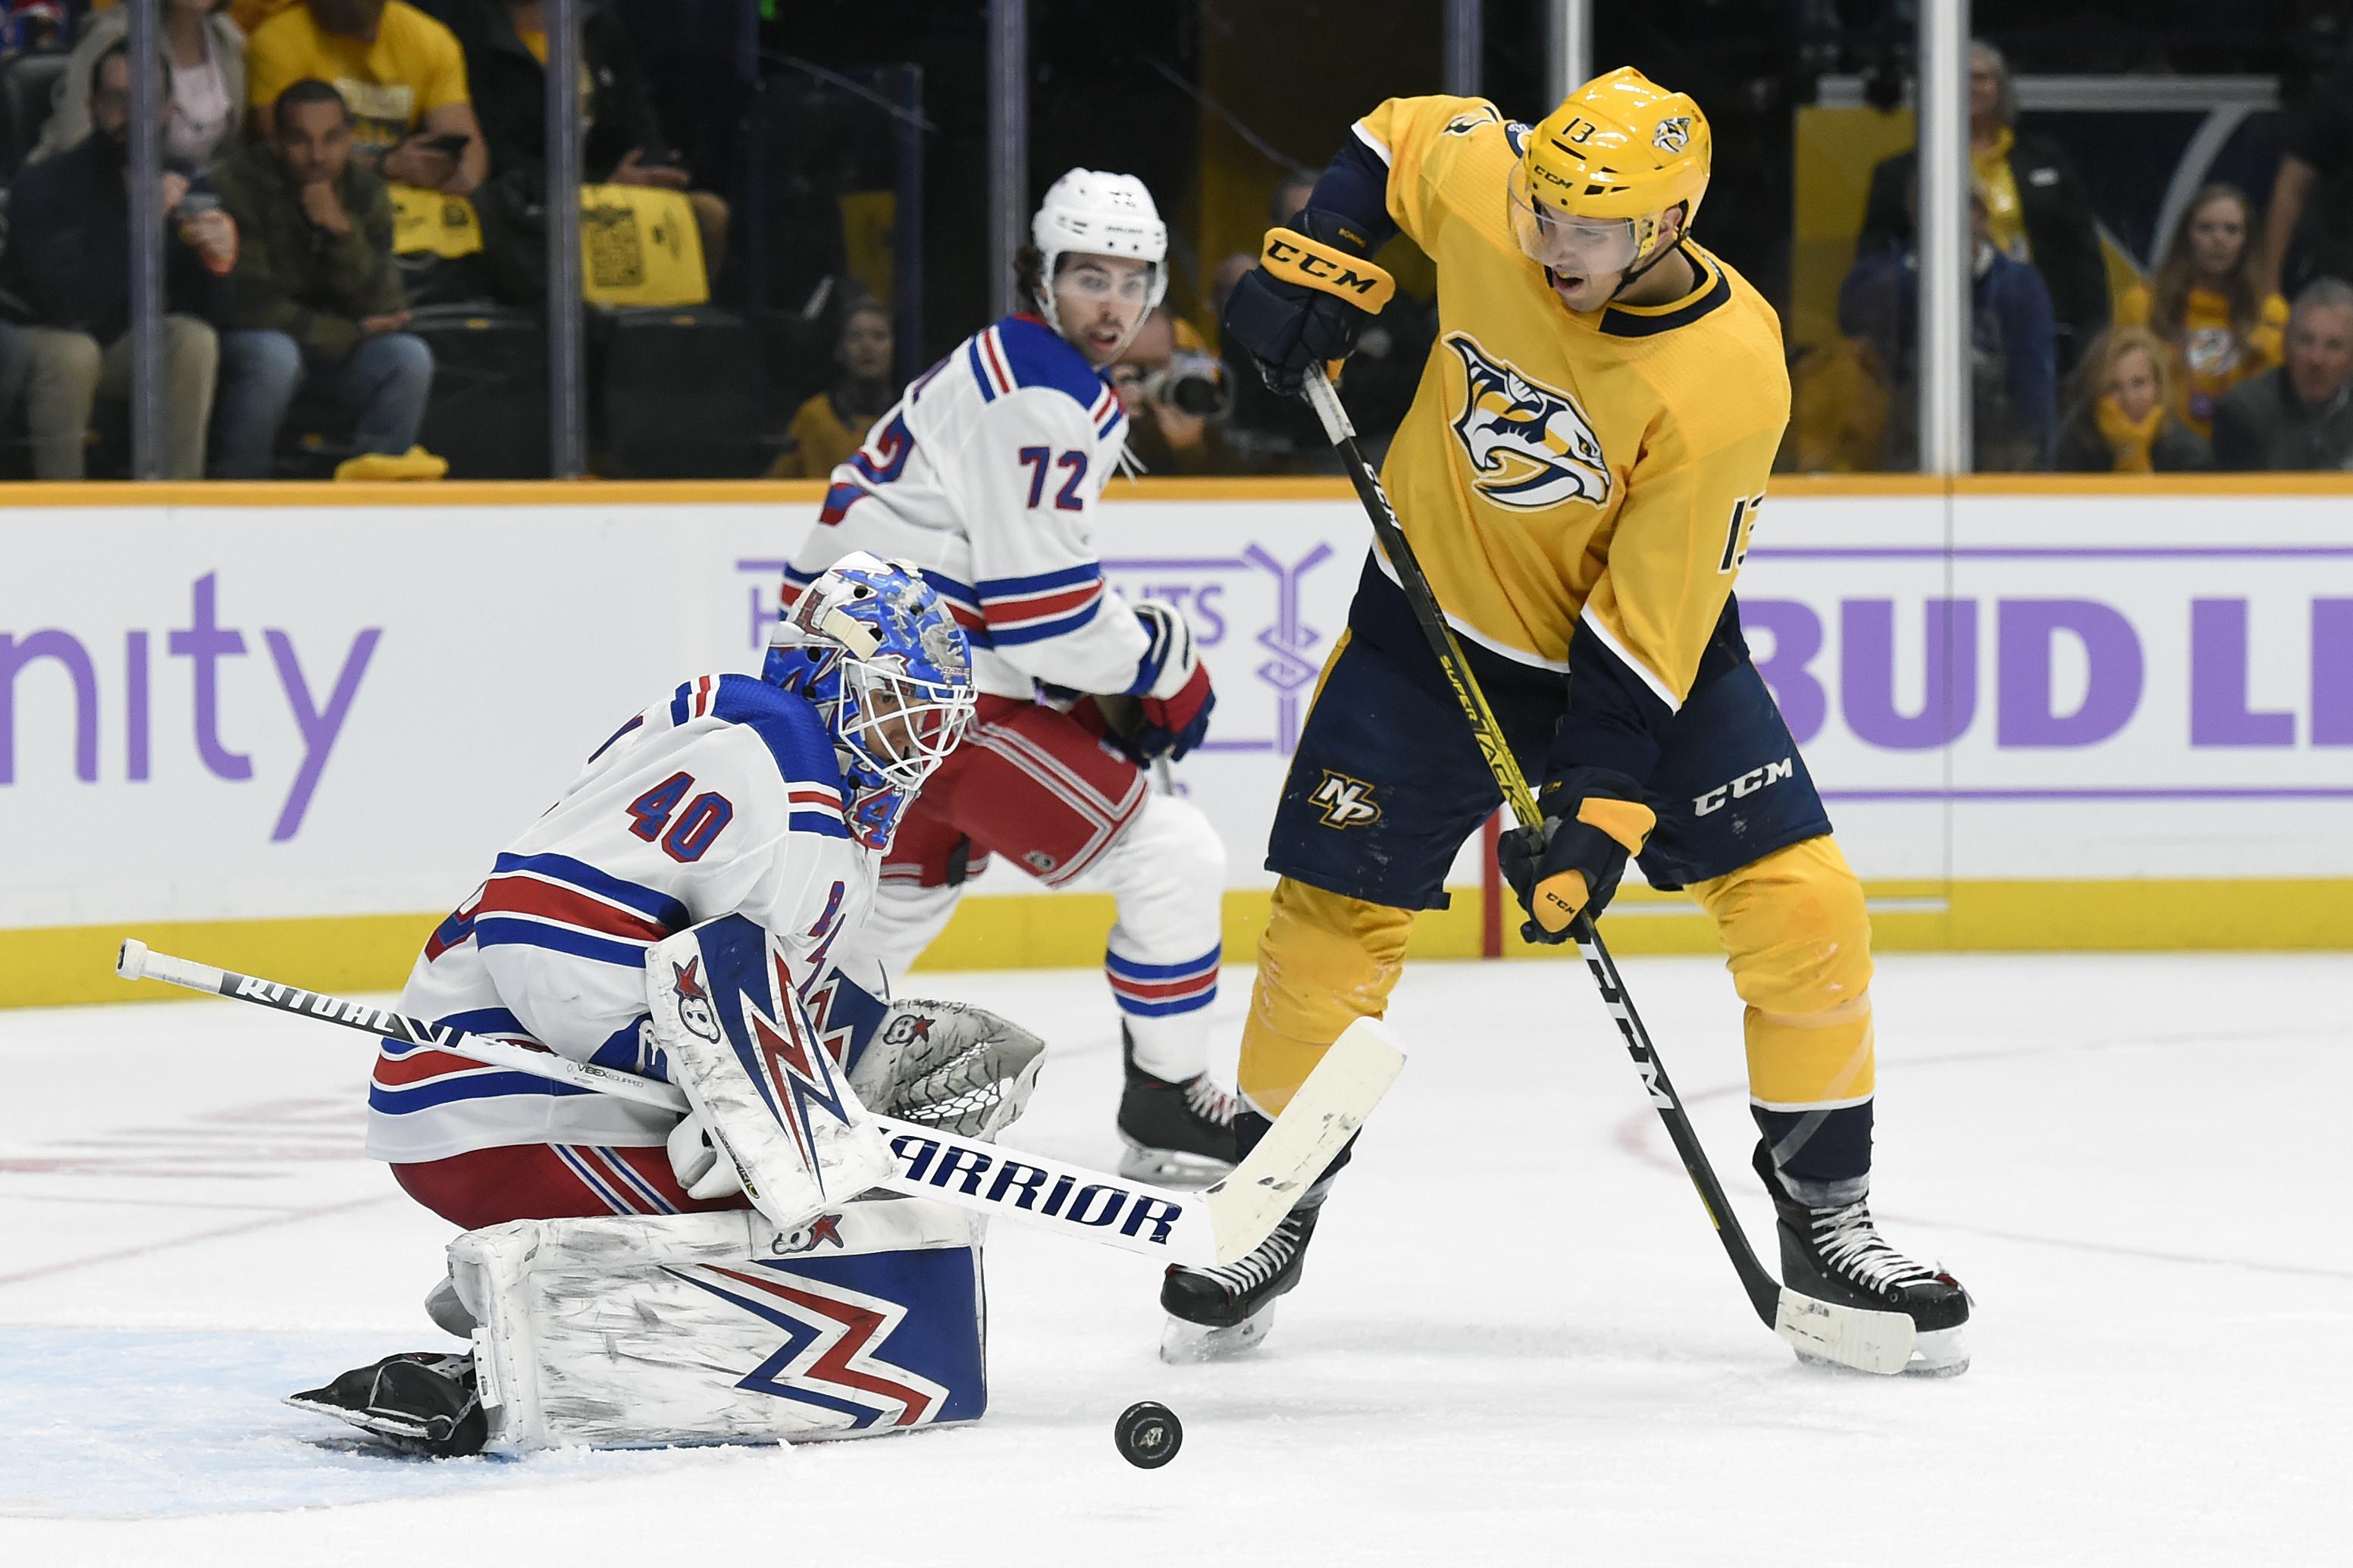 Georgiev's 32 saves leads Rangers over Predators 2-1